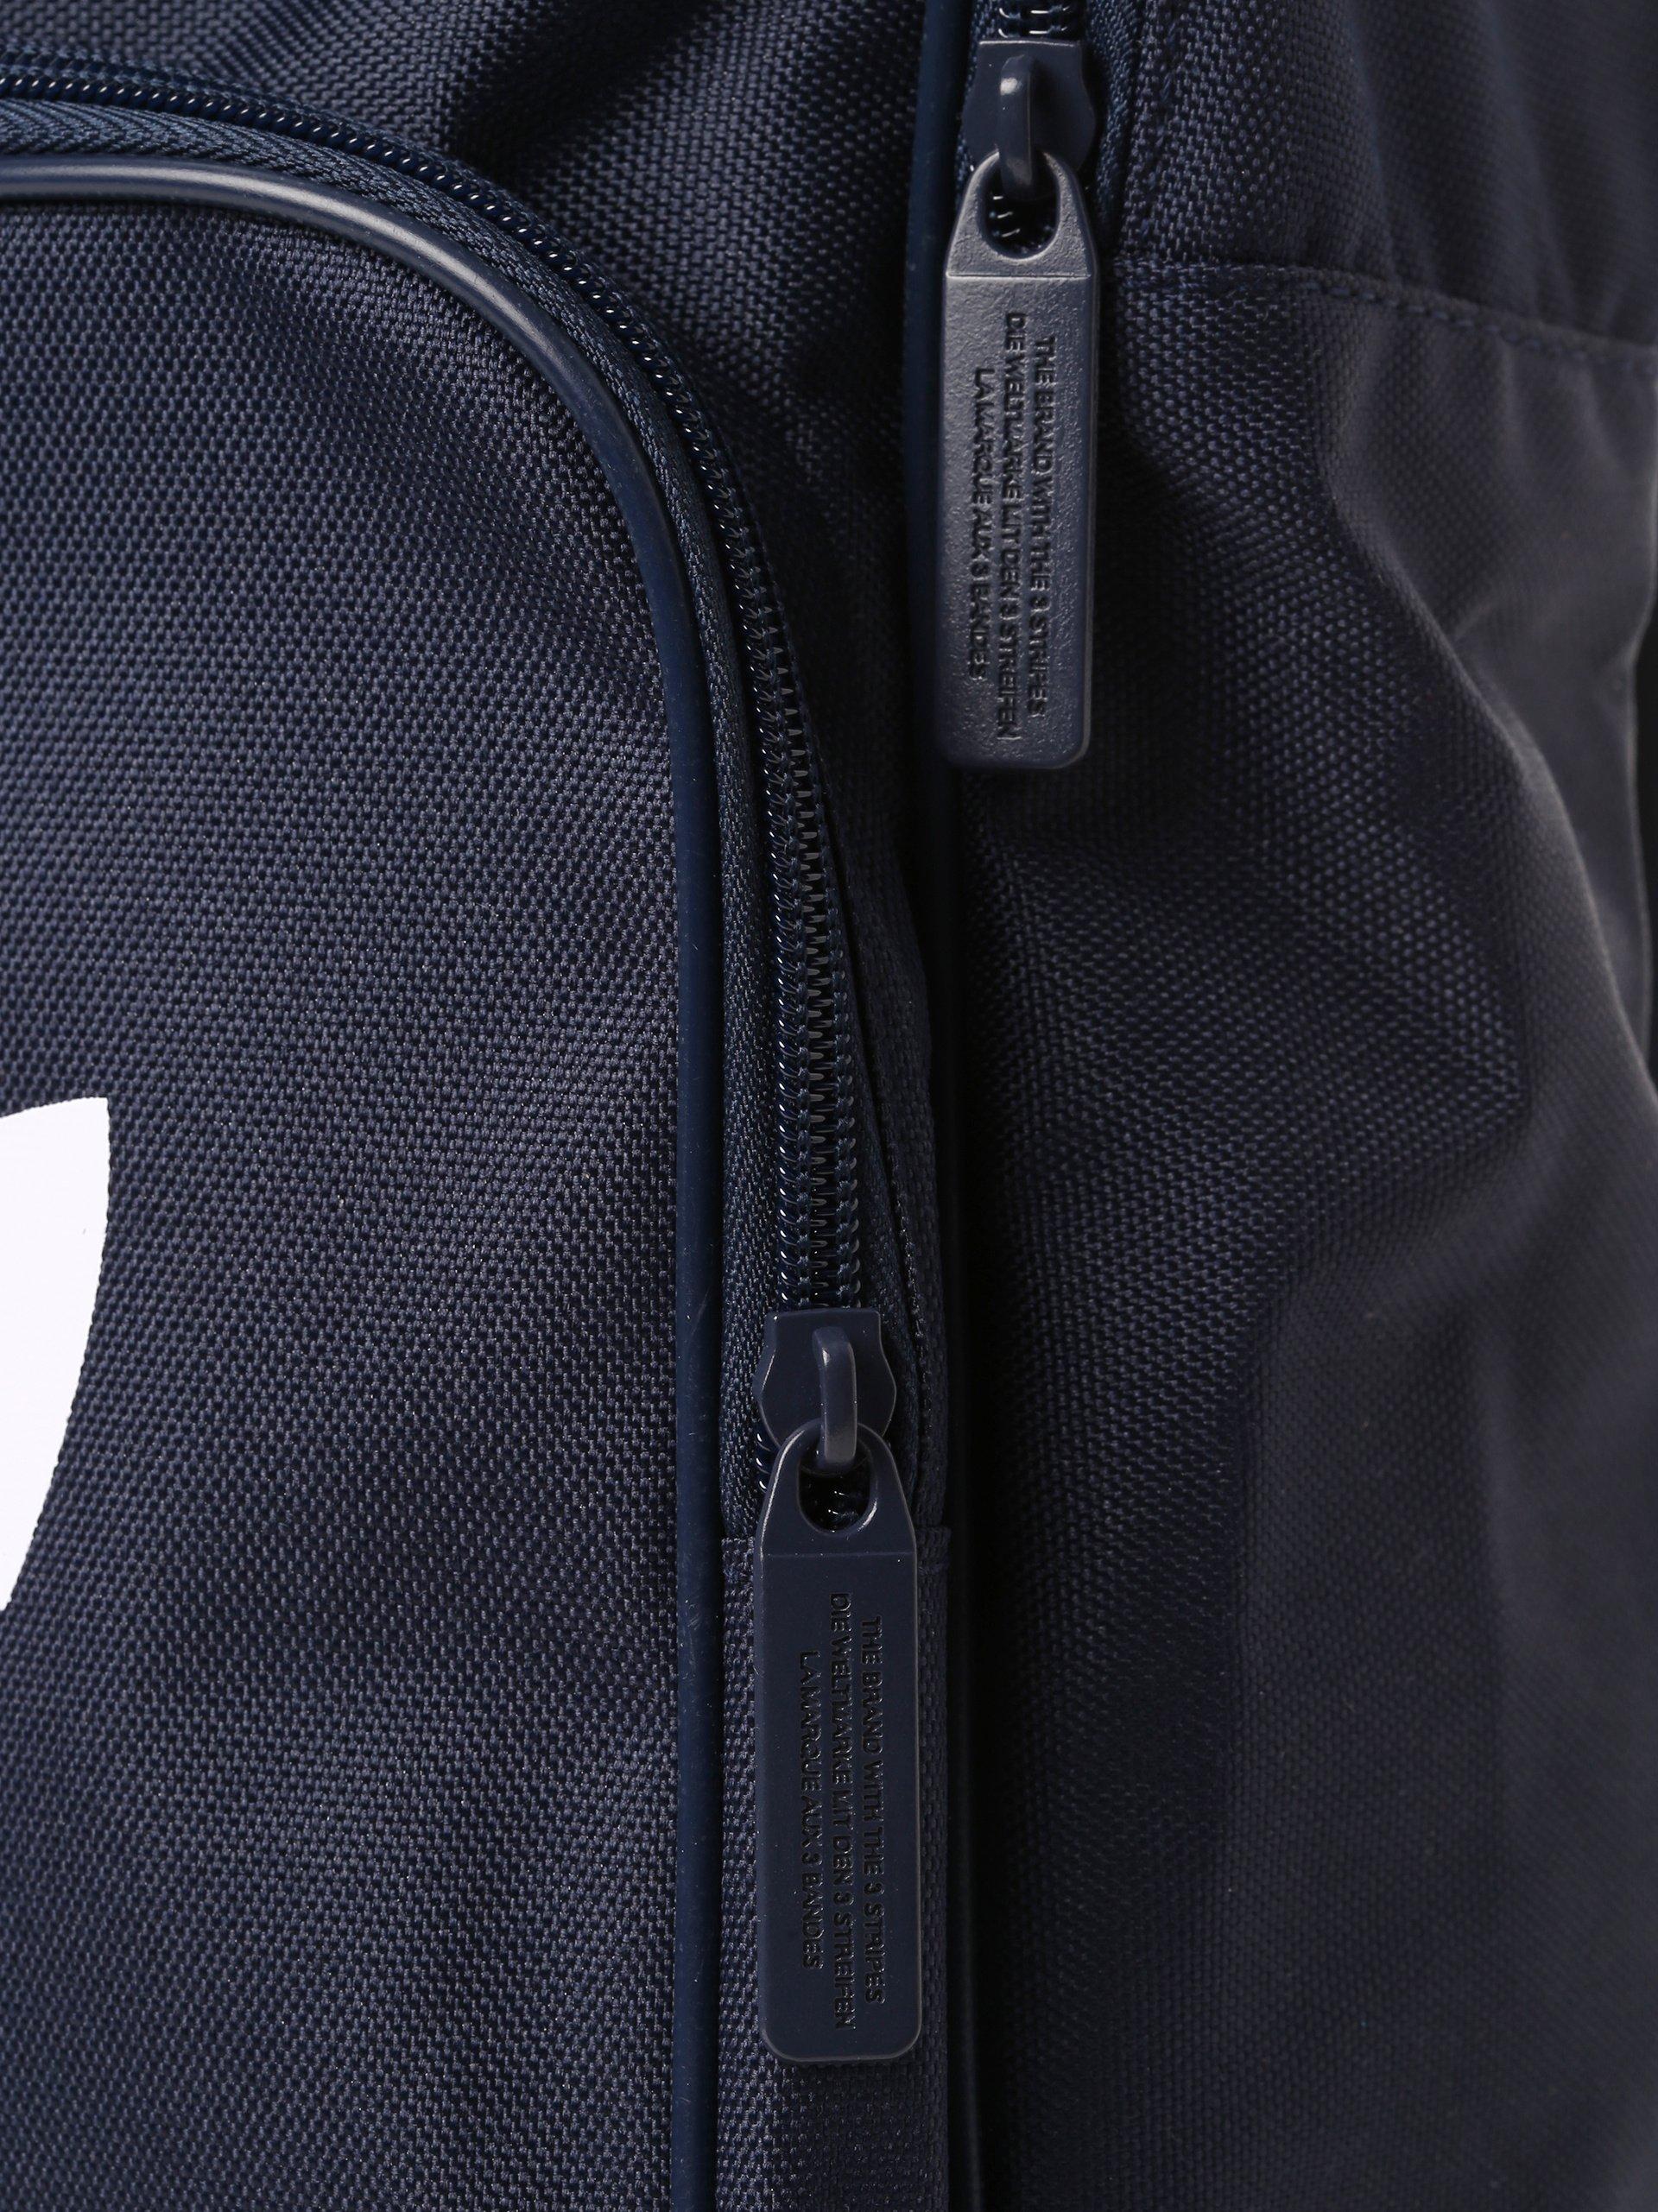 adidas Originals Rucksack mit Logo-Print